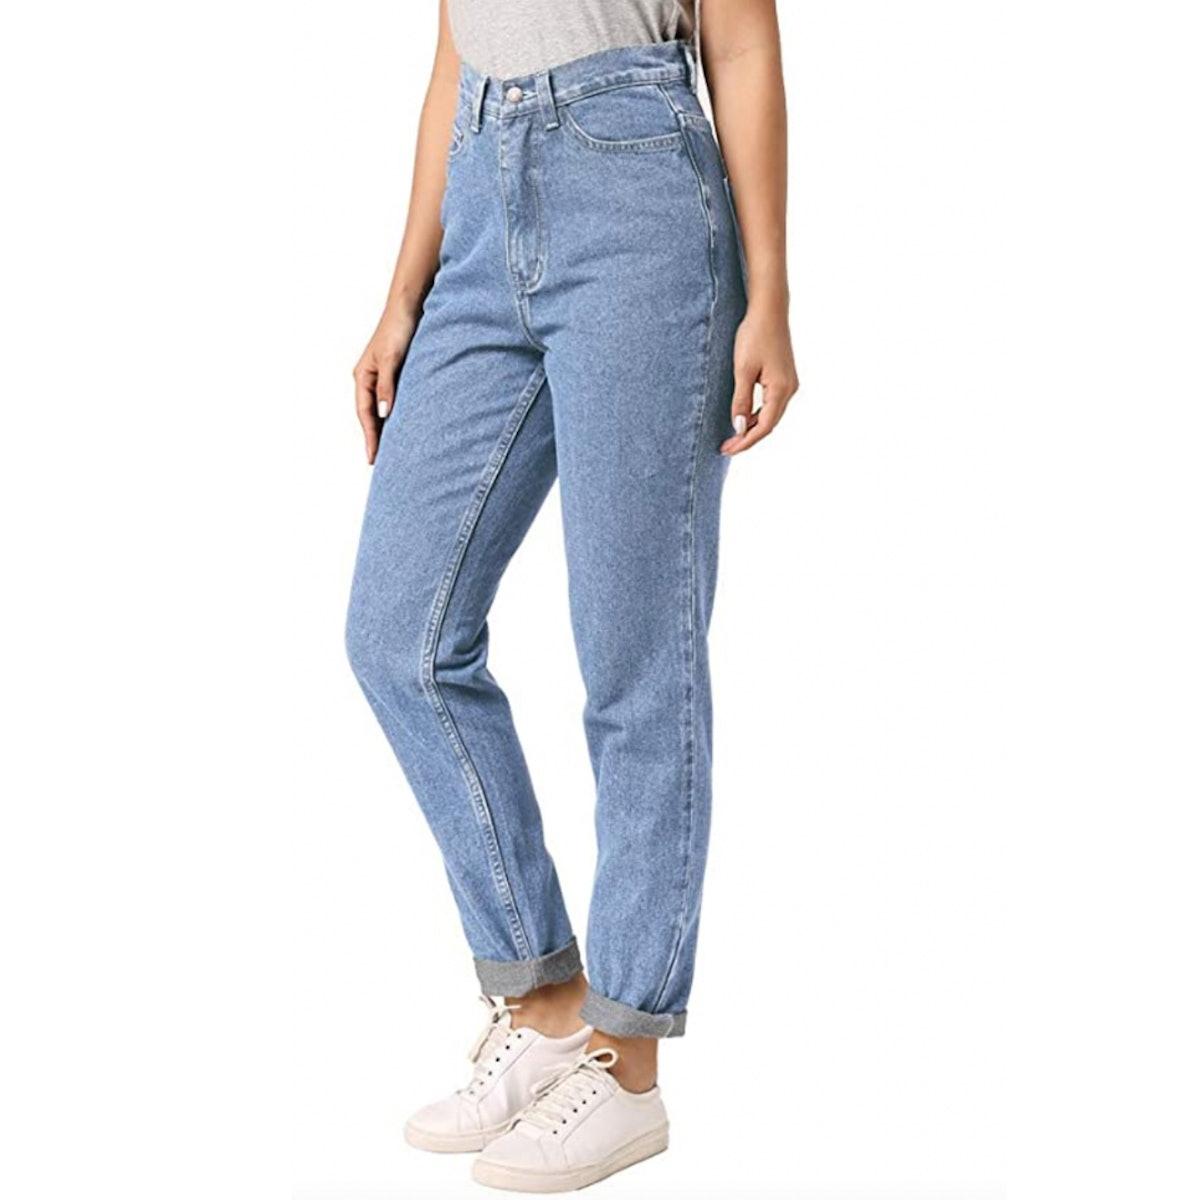 Ruisin High Waist Jeans